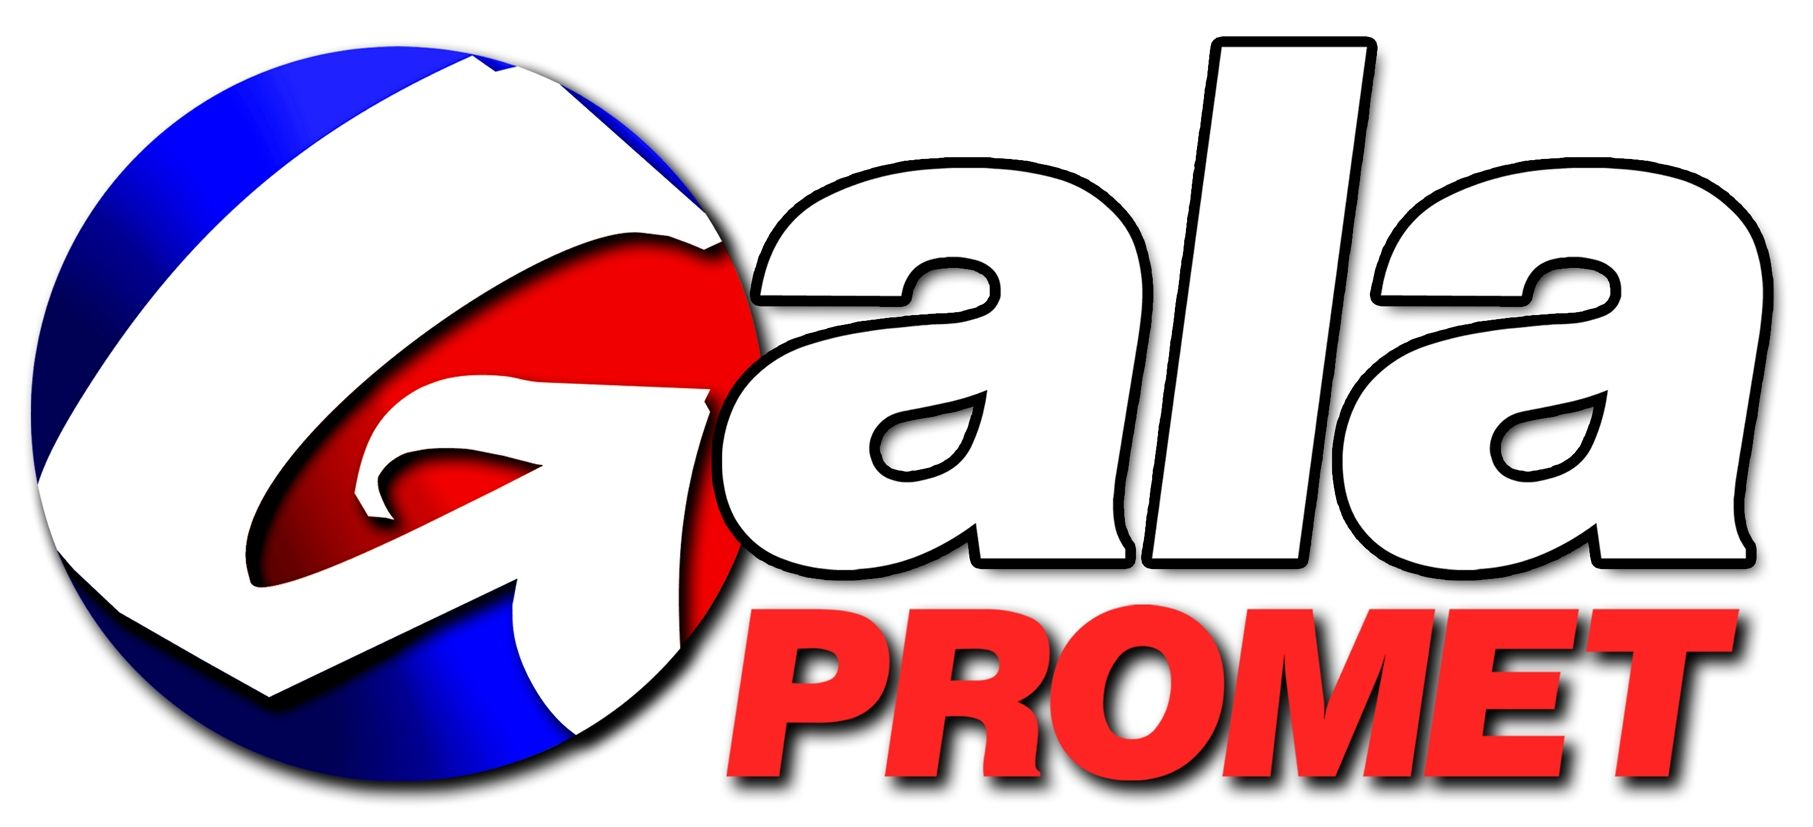 Gala-Promet d.o.o.